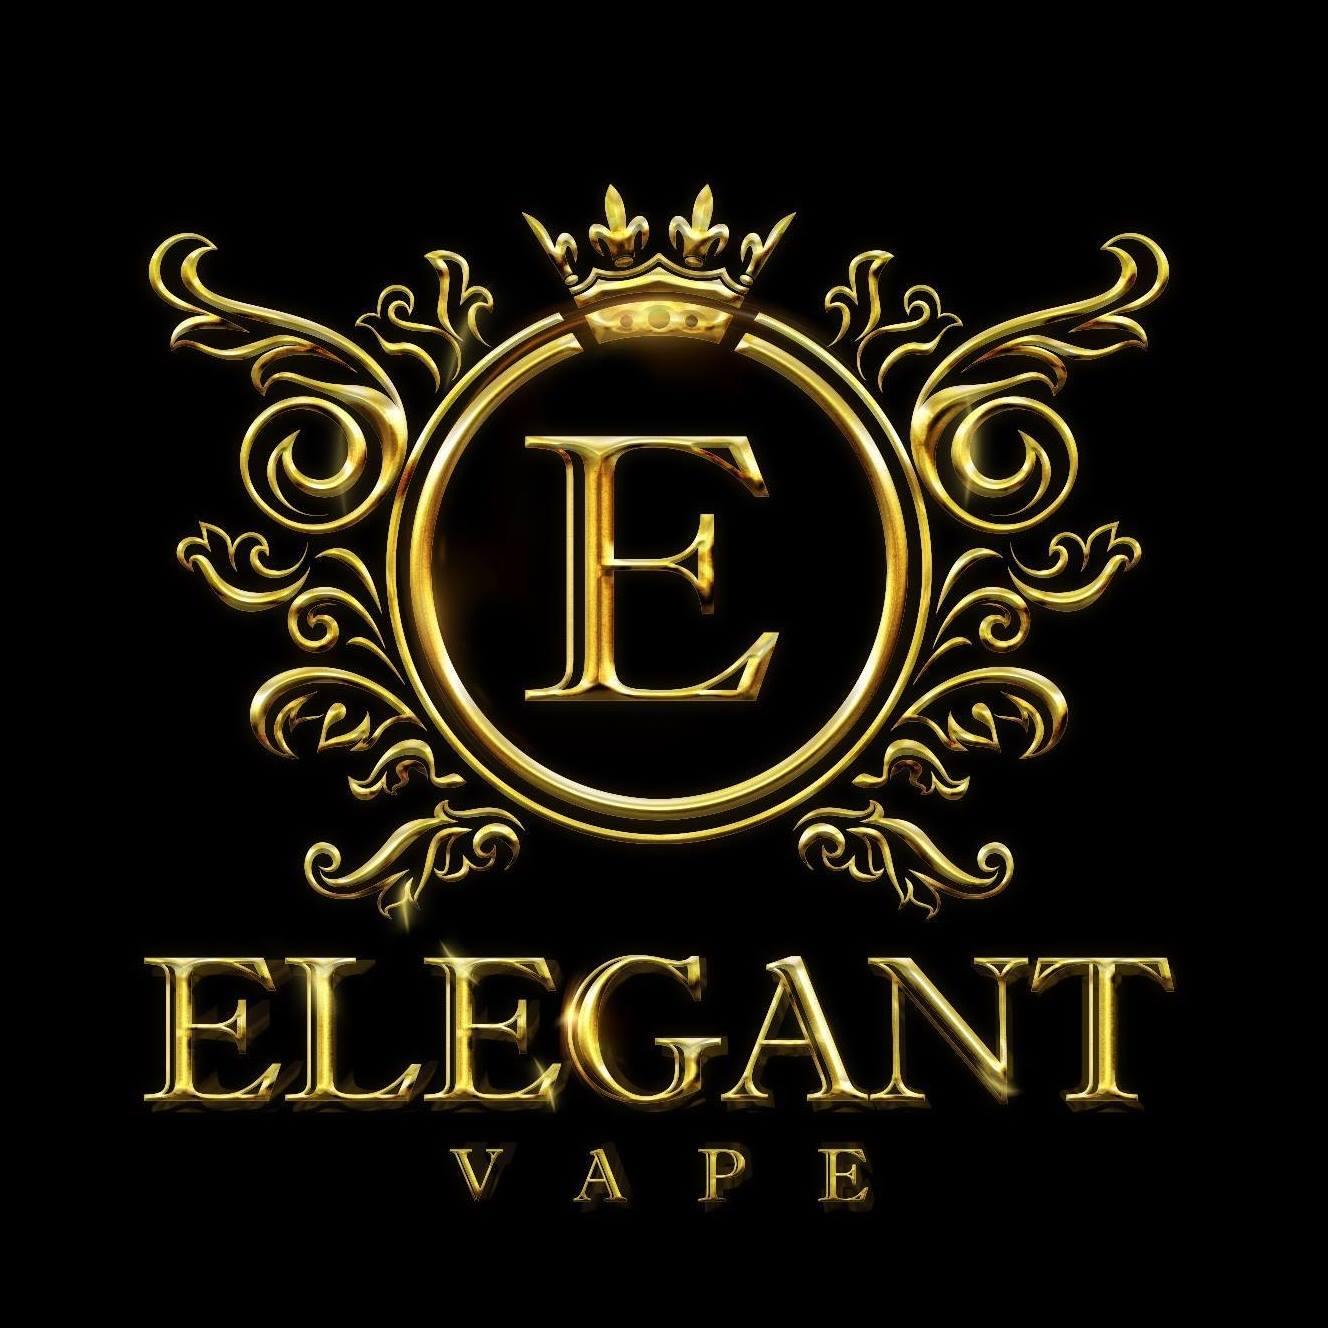 Elegant Vape Store